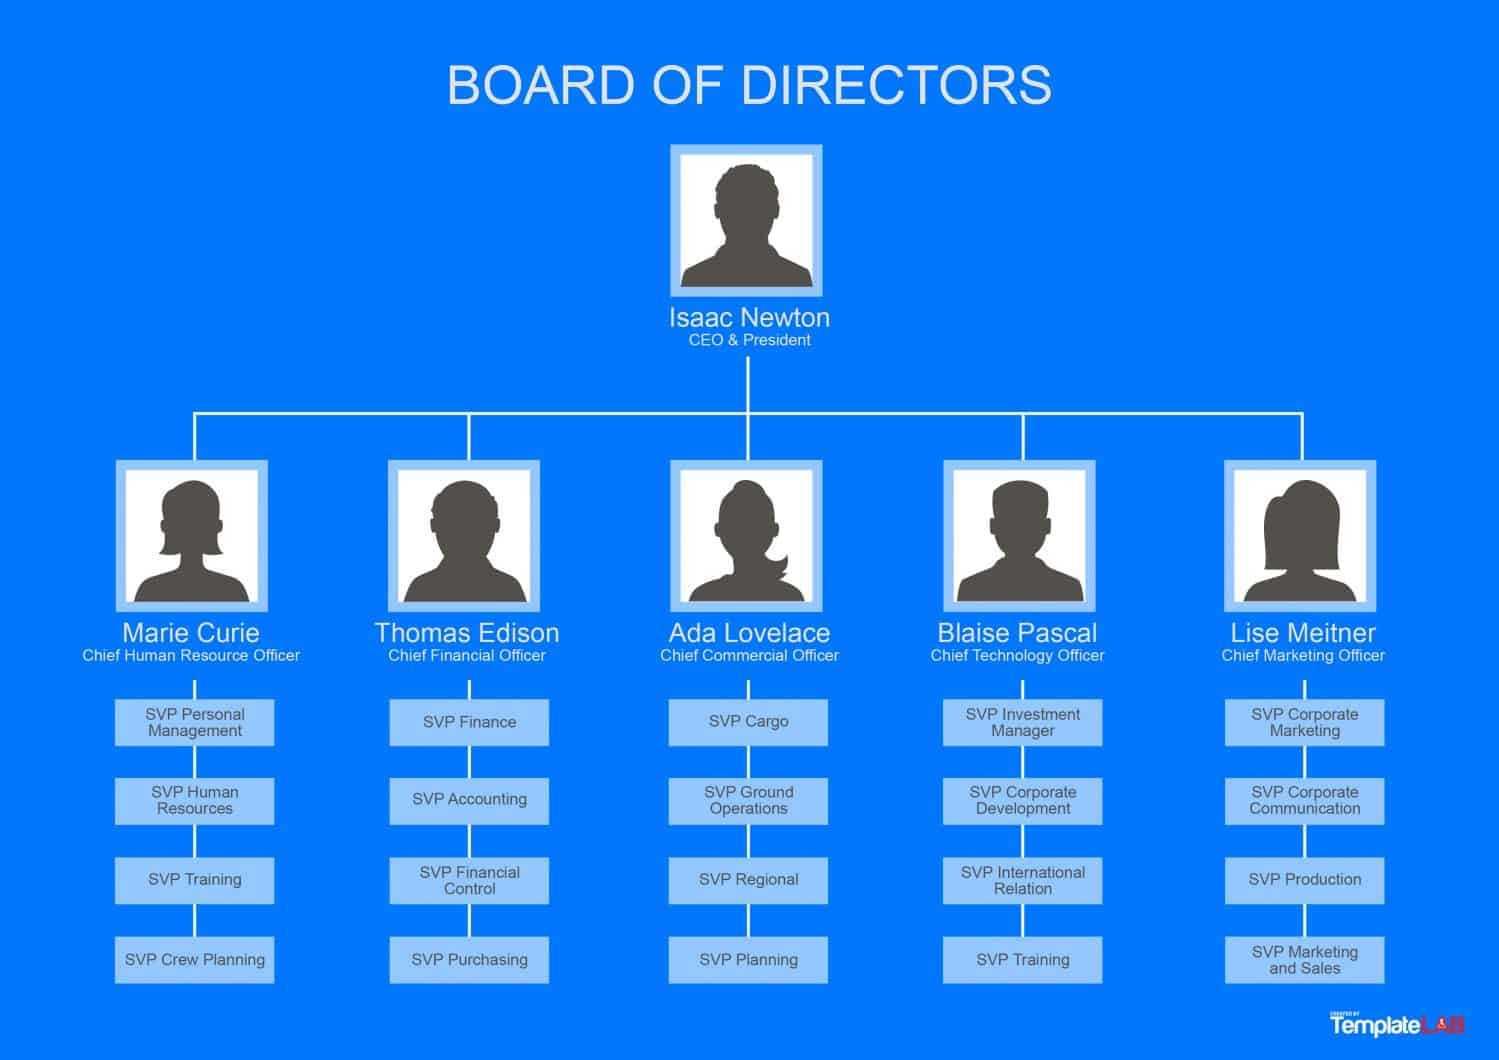 40 Organizational Chart Templates (Word, Excel, Powerpoint) Regarding Org Chart Template Word